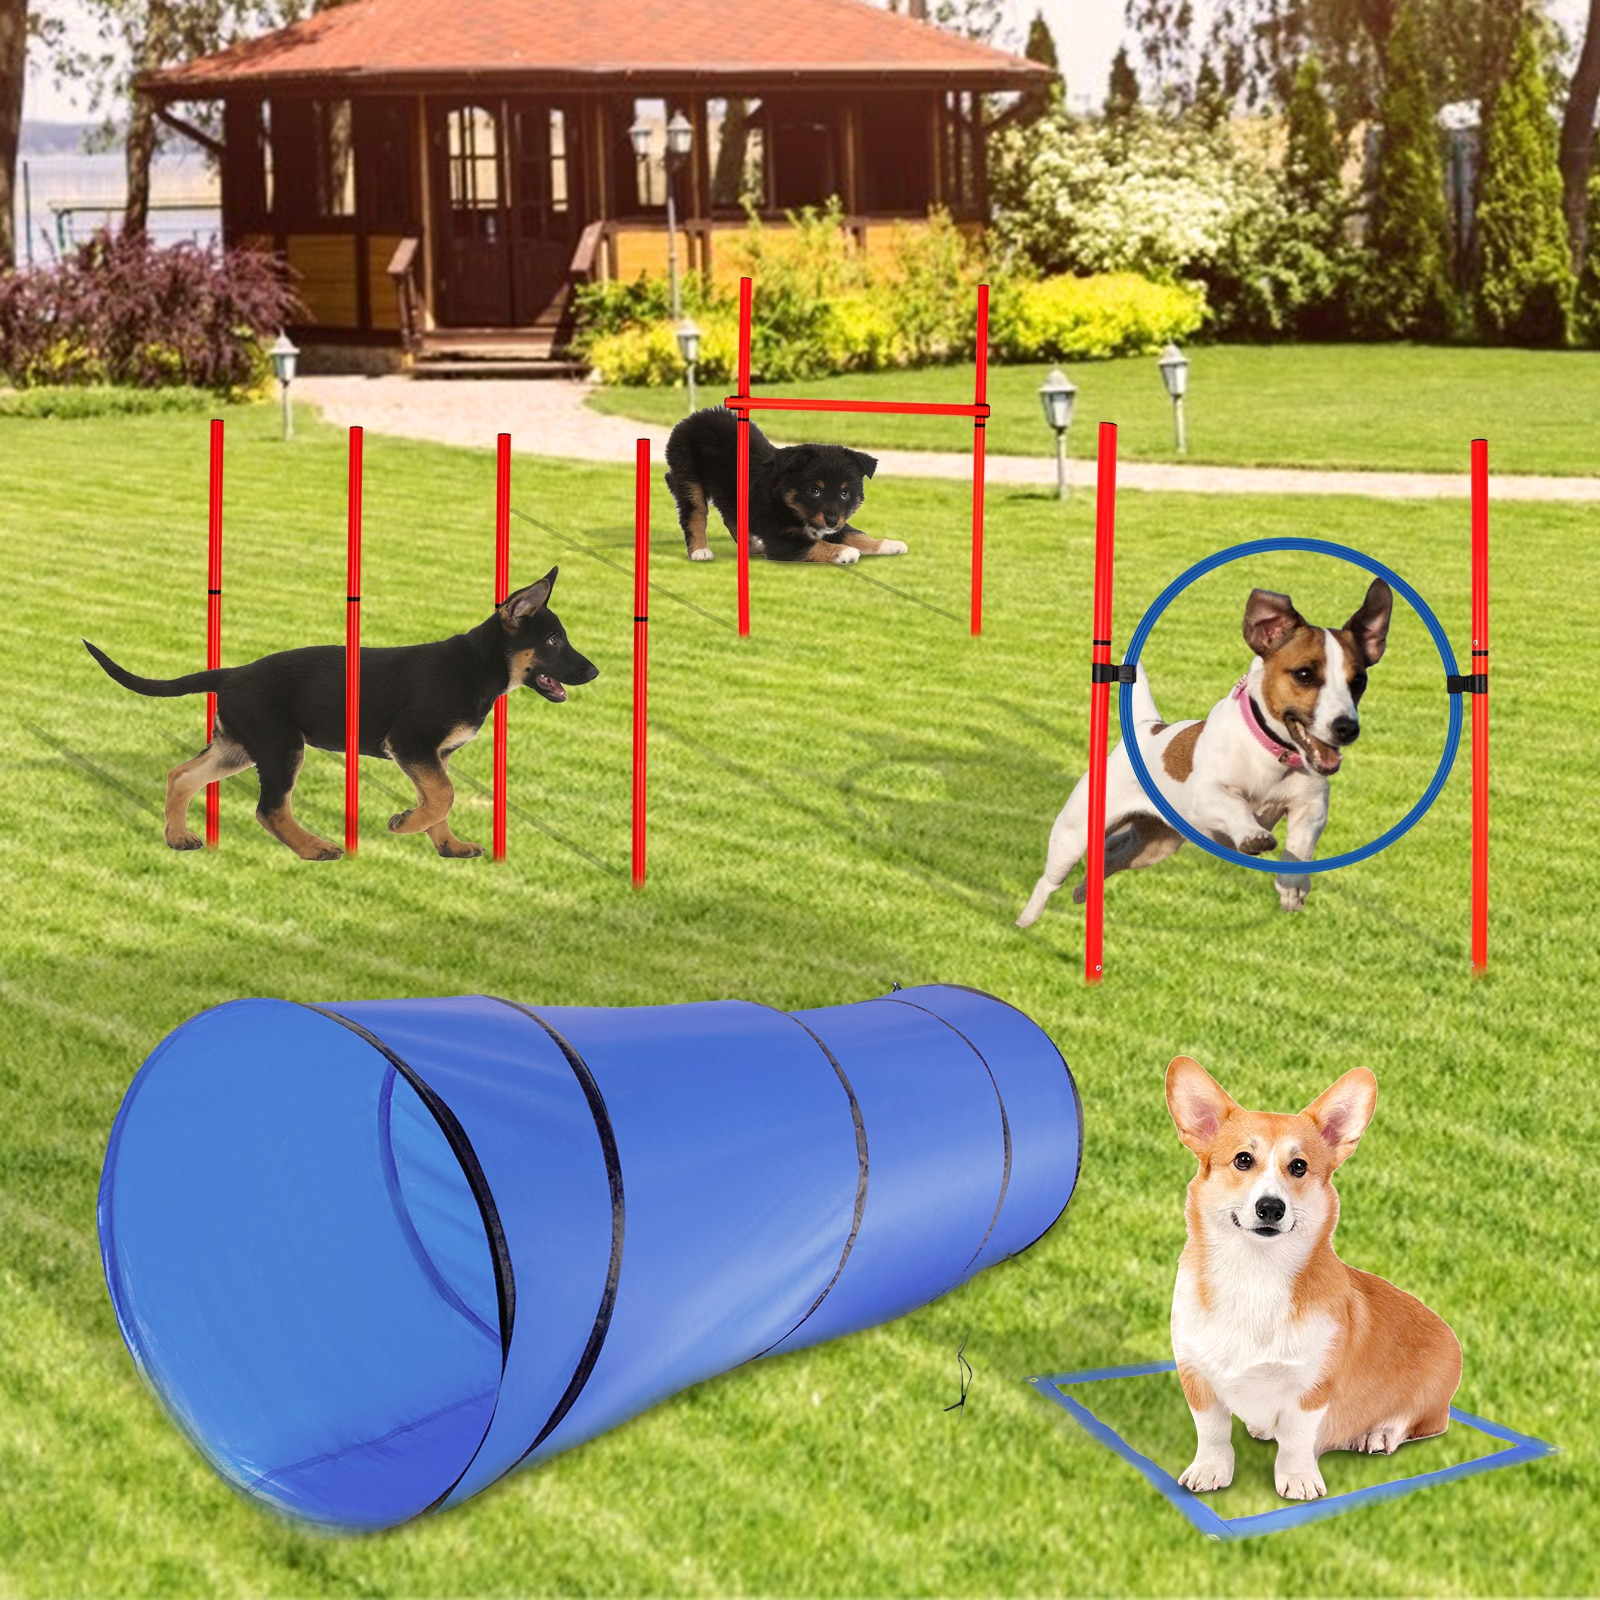 Dog Agility Training Tool Dog Training Toy Training Channel Agility Tunnel High Jump Pole Agility Jump Ring Set enlarge